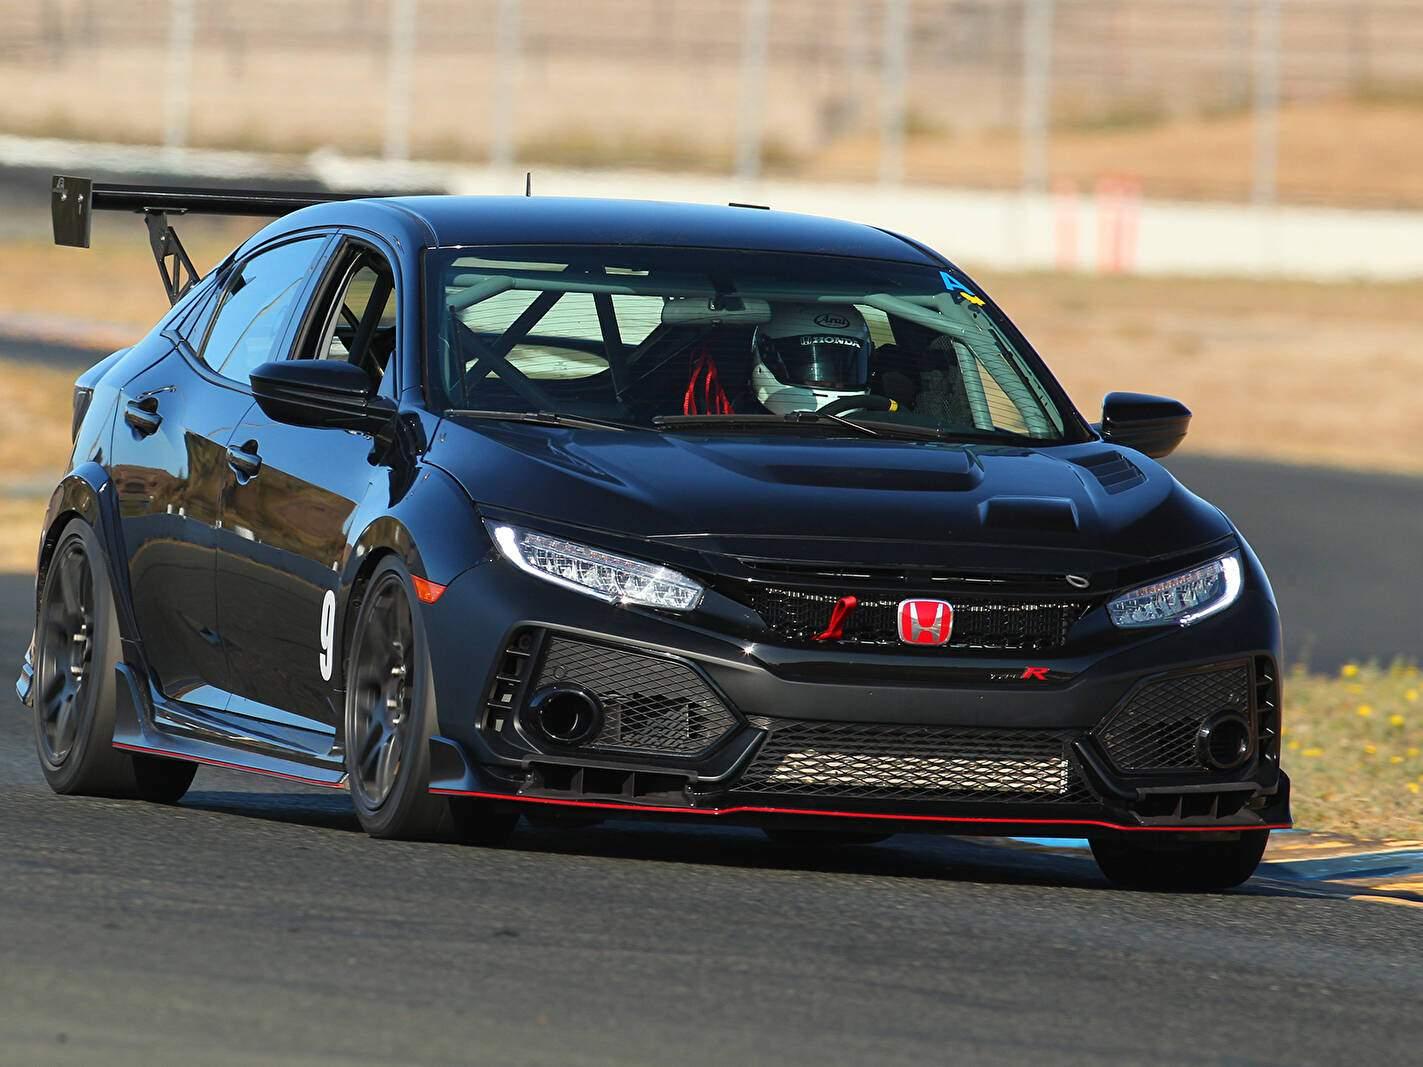 How does the ford focus sedan compare to the honda civic si sedan? Fiche technique Honda Civic Type-R TC (2019)